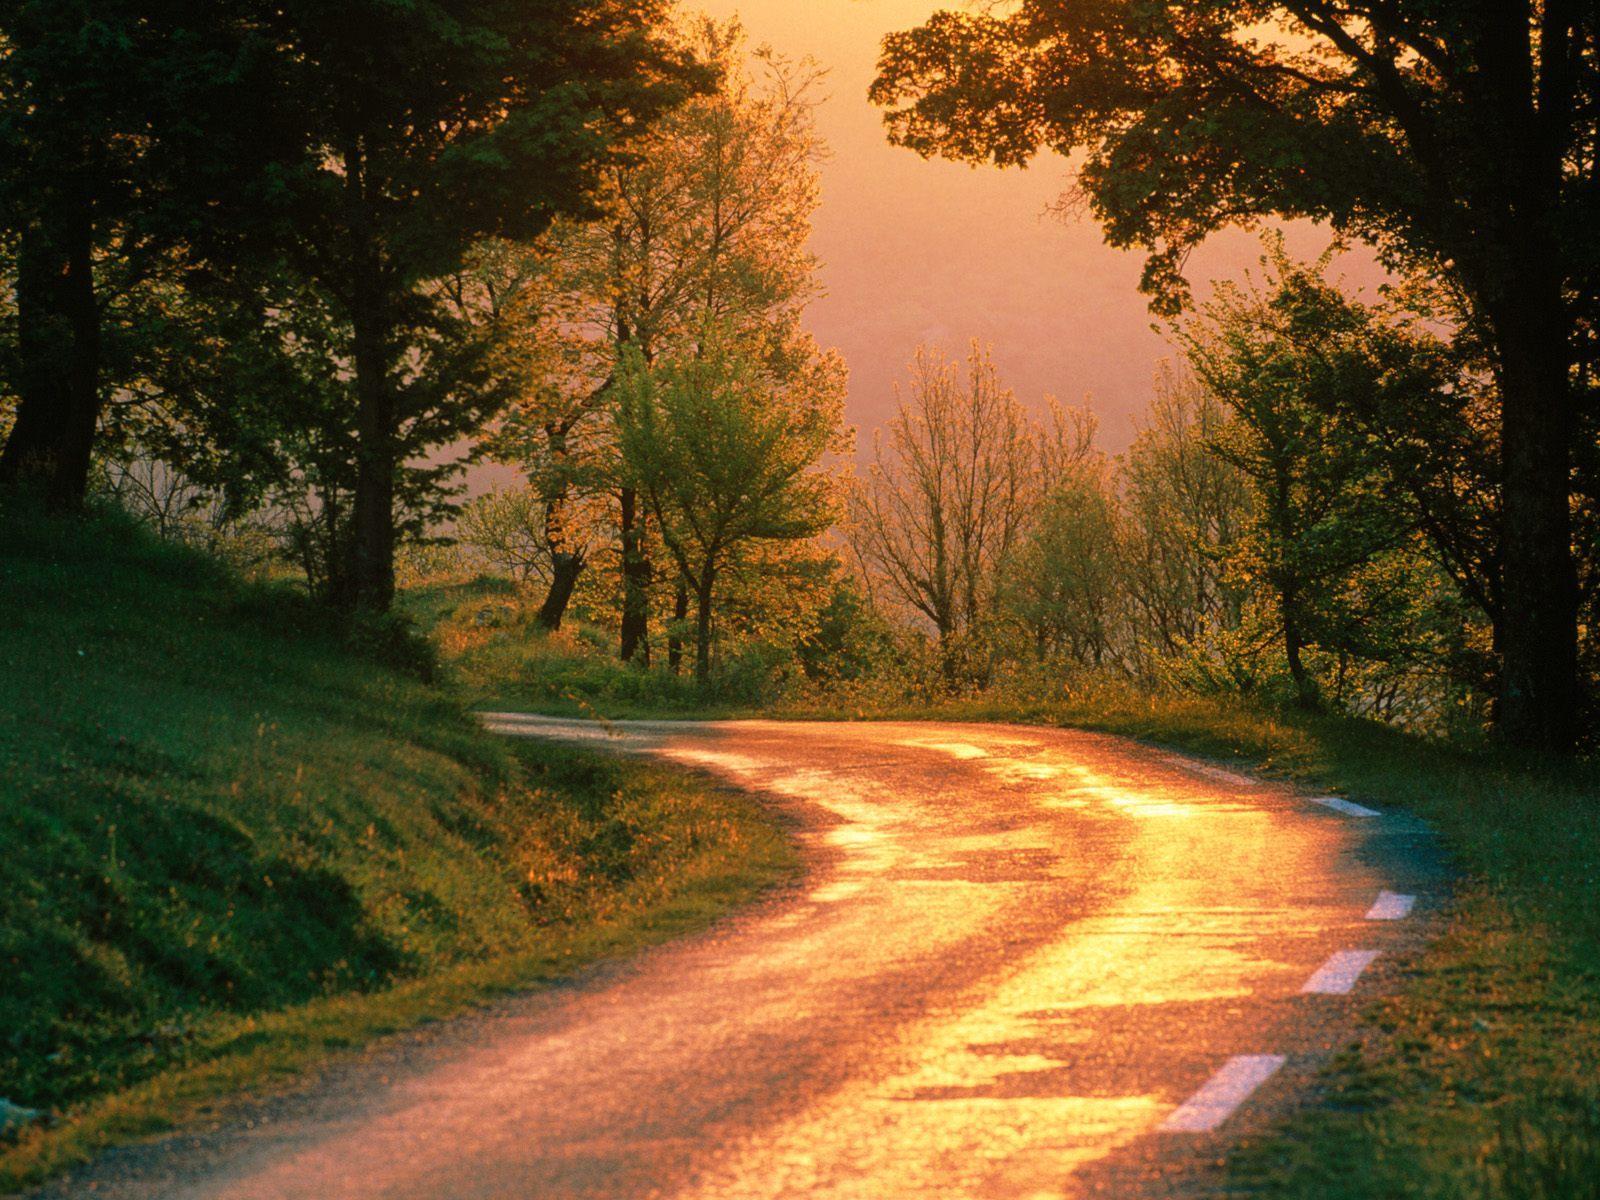 http://2.bp.blogspot.com/_pOW9LvKap60/TO0kjsNOxOI/AAAAAAAAADo/26ryvluz7Dg/s1600/golden_road%252C_france.jpg